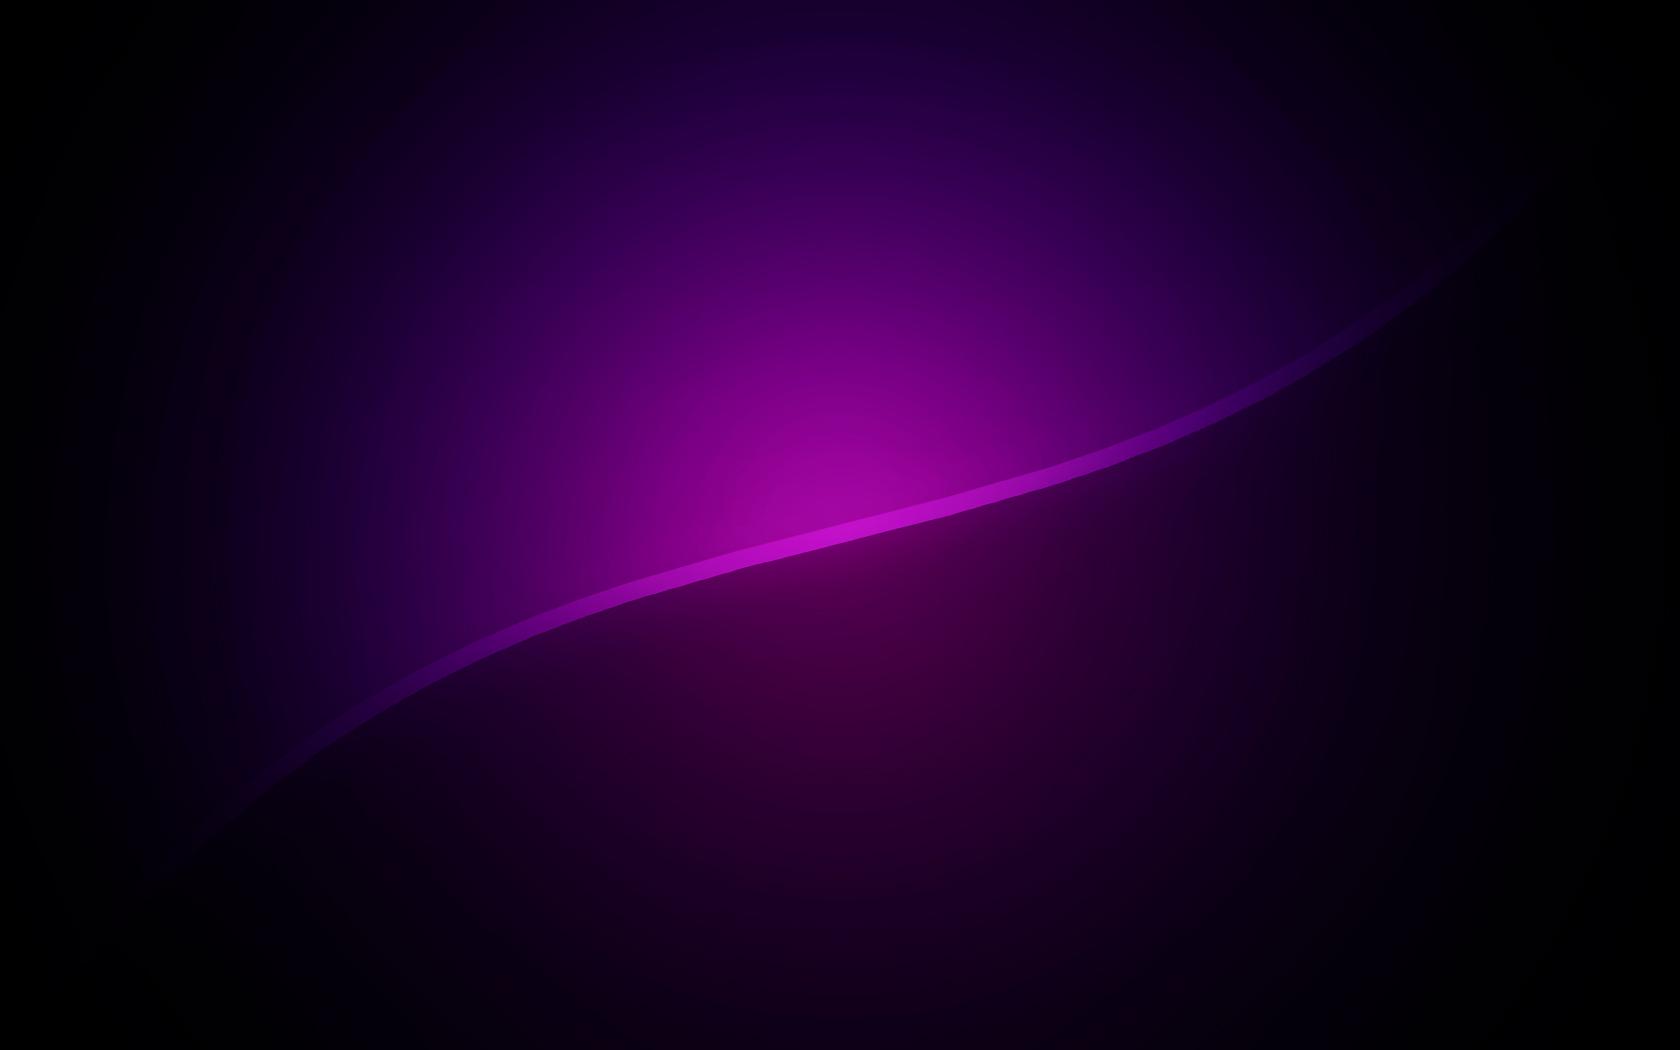 Violet by Mikkoliini